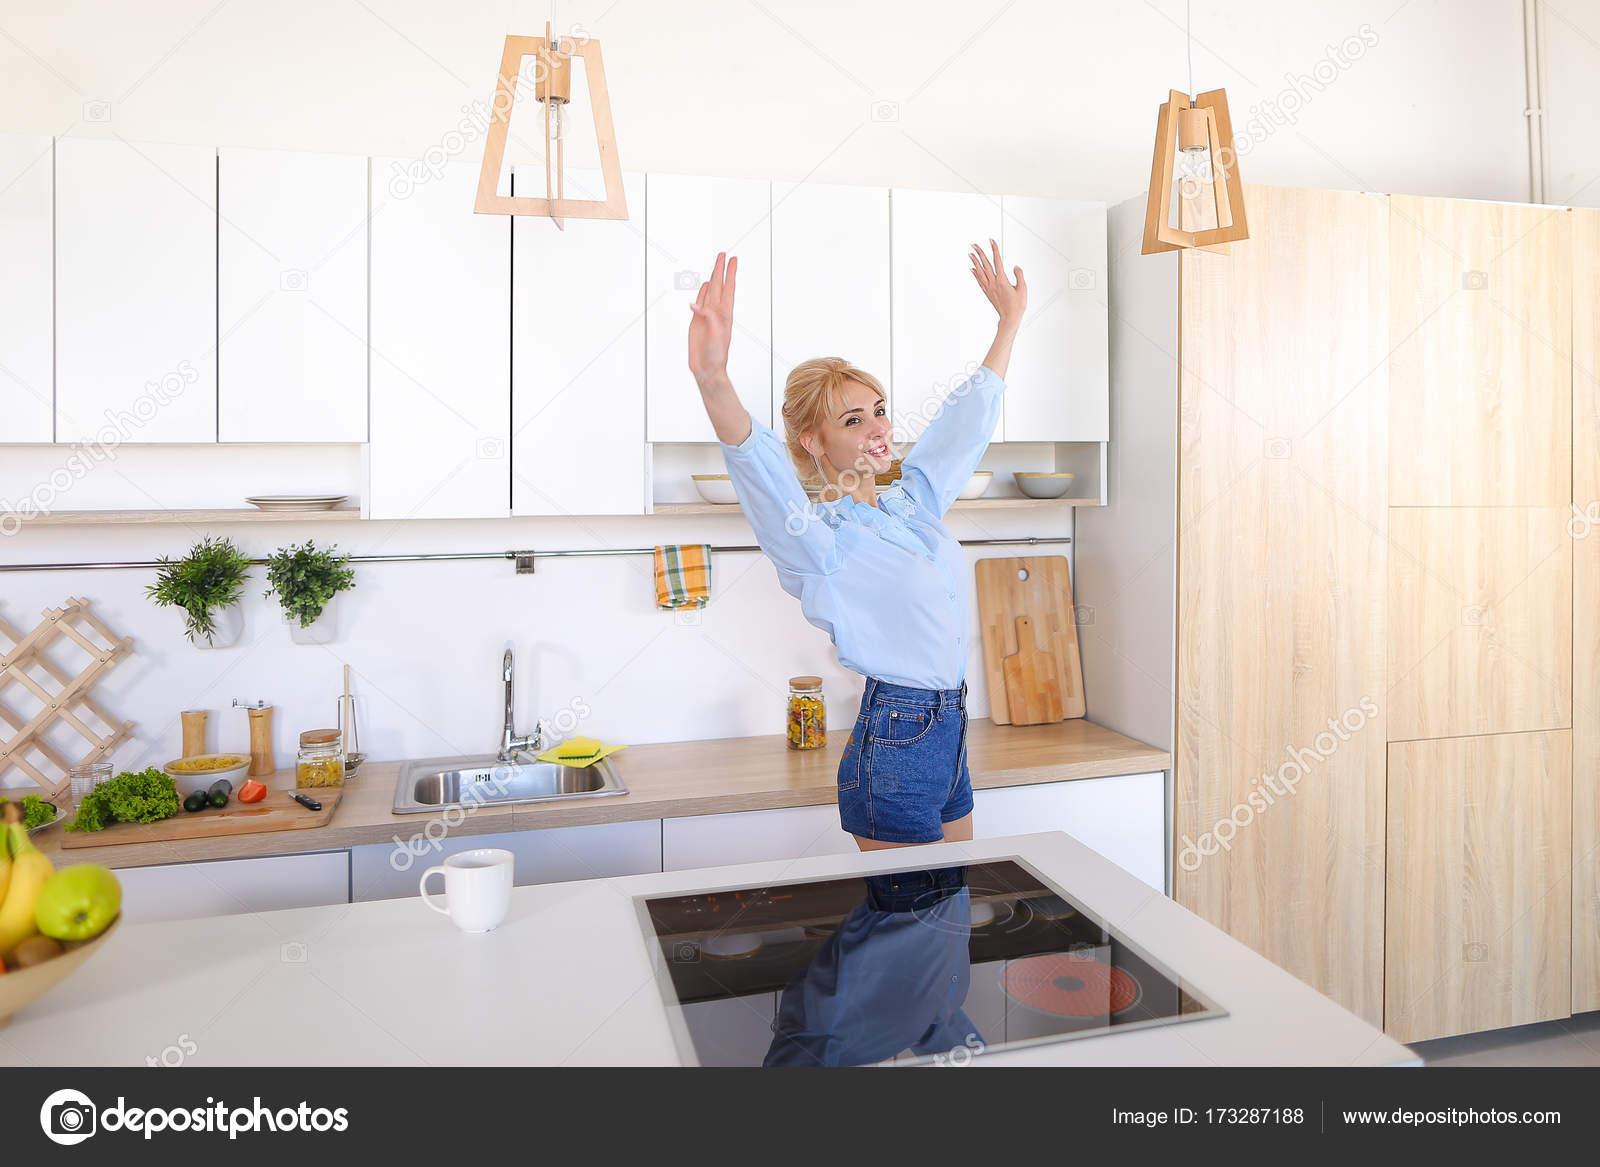 nice kitchen tables lowes appliances 漂亮的女孩走进了厨房和伸展运动 享受早晨c 图库照片 c sisterspro 有魅力的女人走过来和去厨房的桌子 举起双手向两侧上下能缓解紧张和花费手香早上新鲜咖啡 用轻松的笑容 站在中间的笑